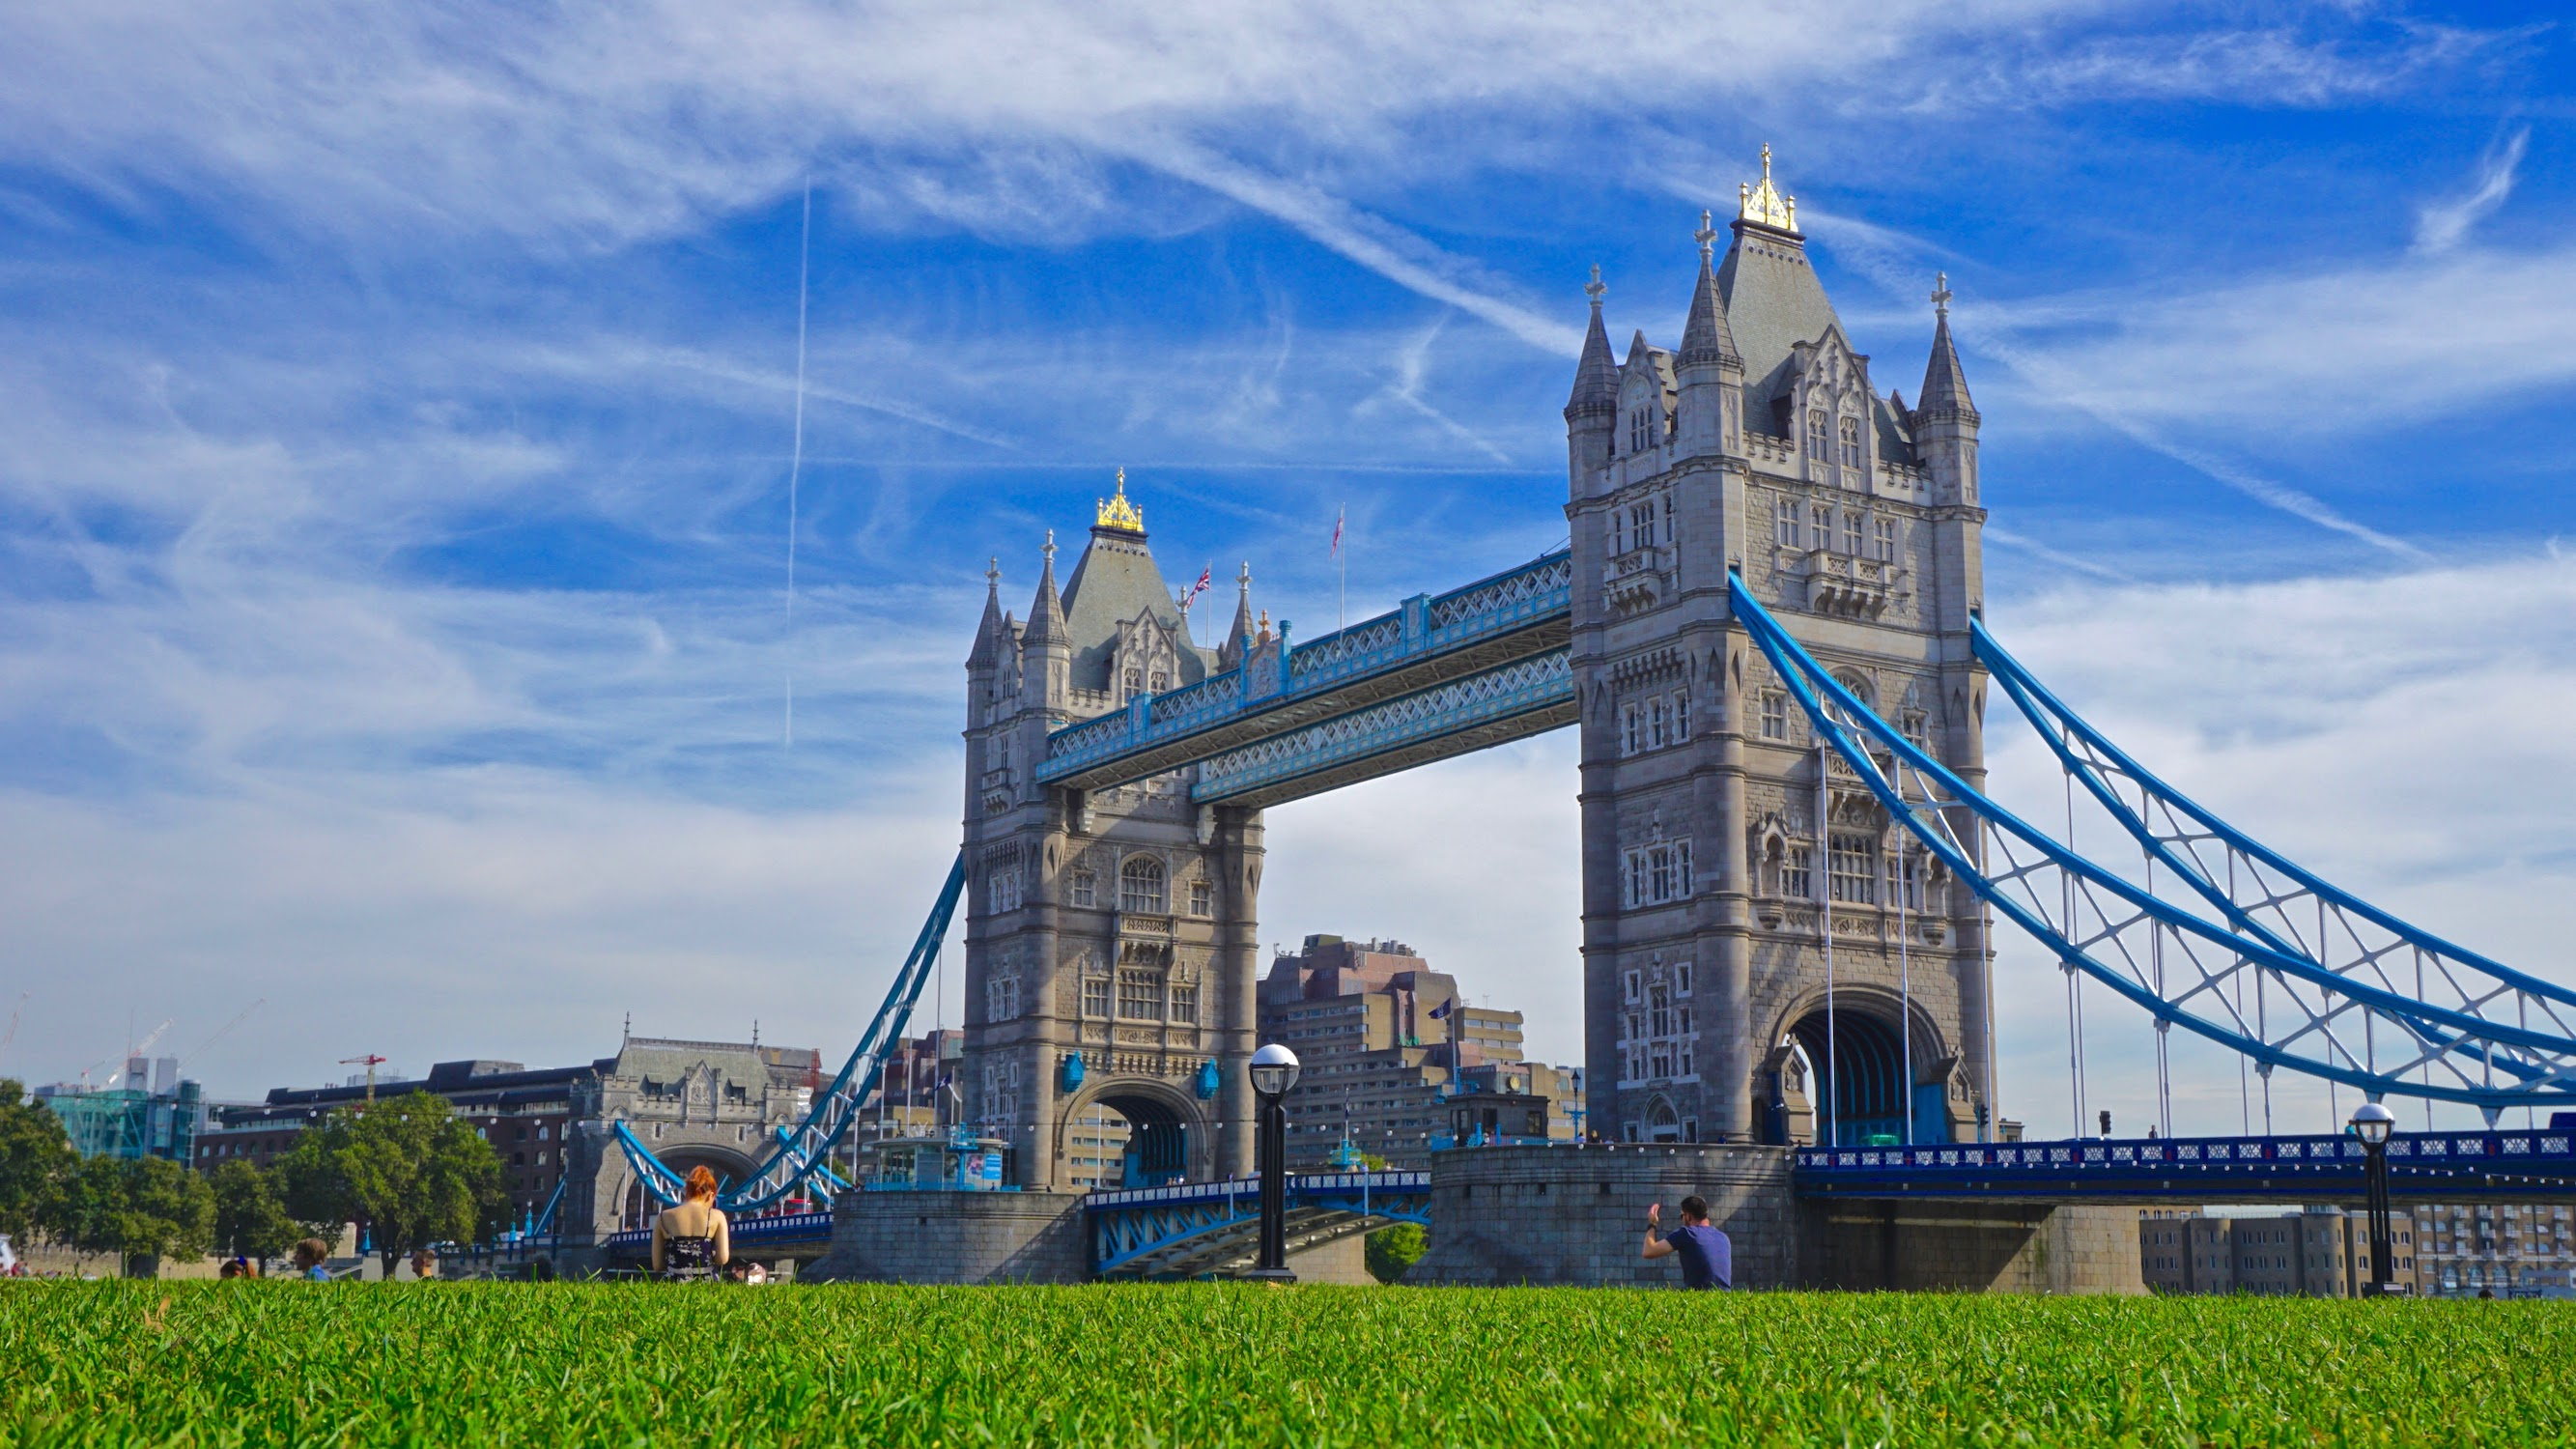 Tower Bridge (02)